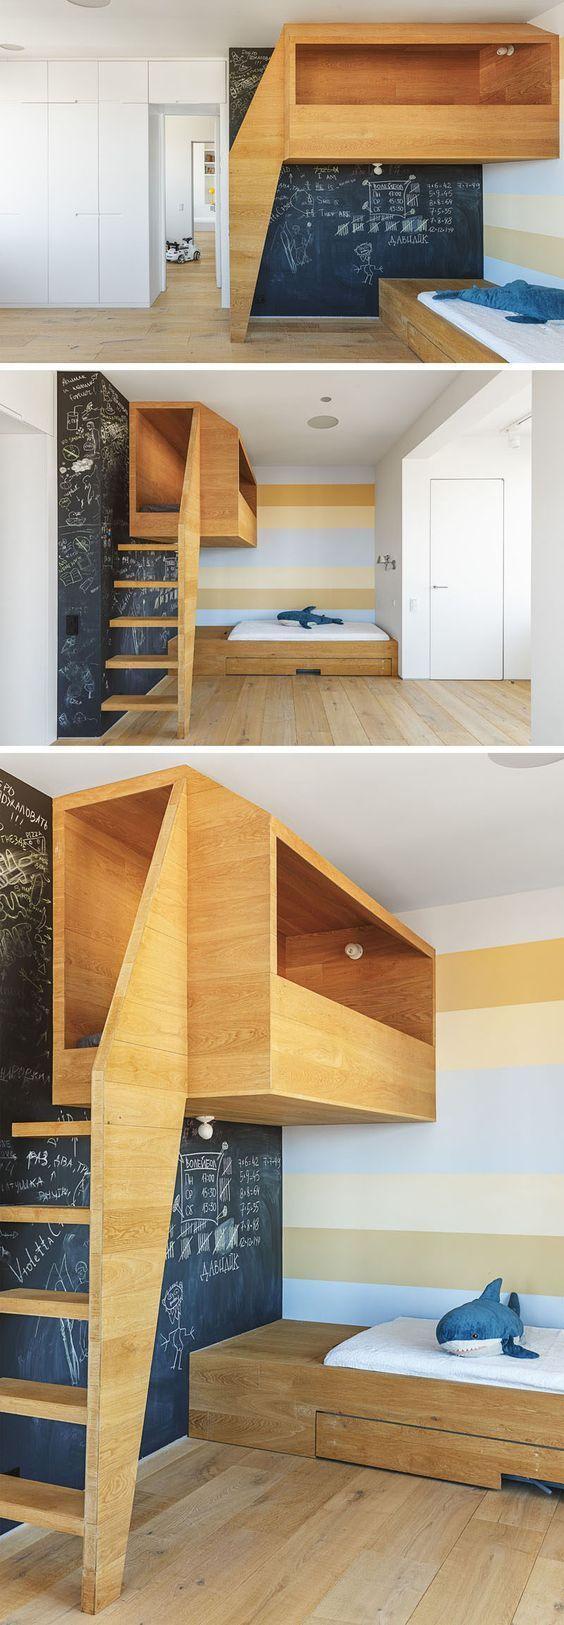 Art #Creation #Design #Decoration  Interiores de casas pequeñas